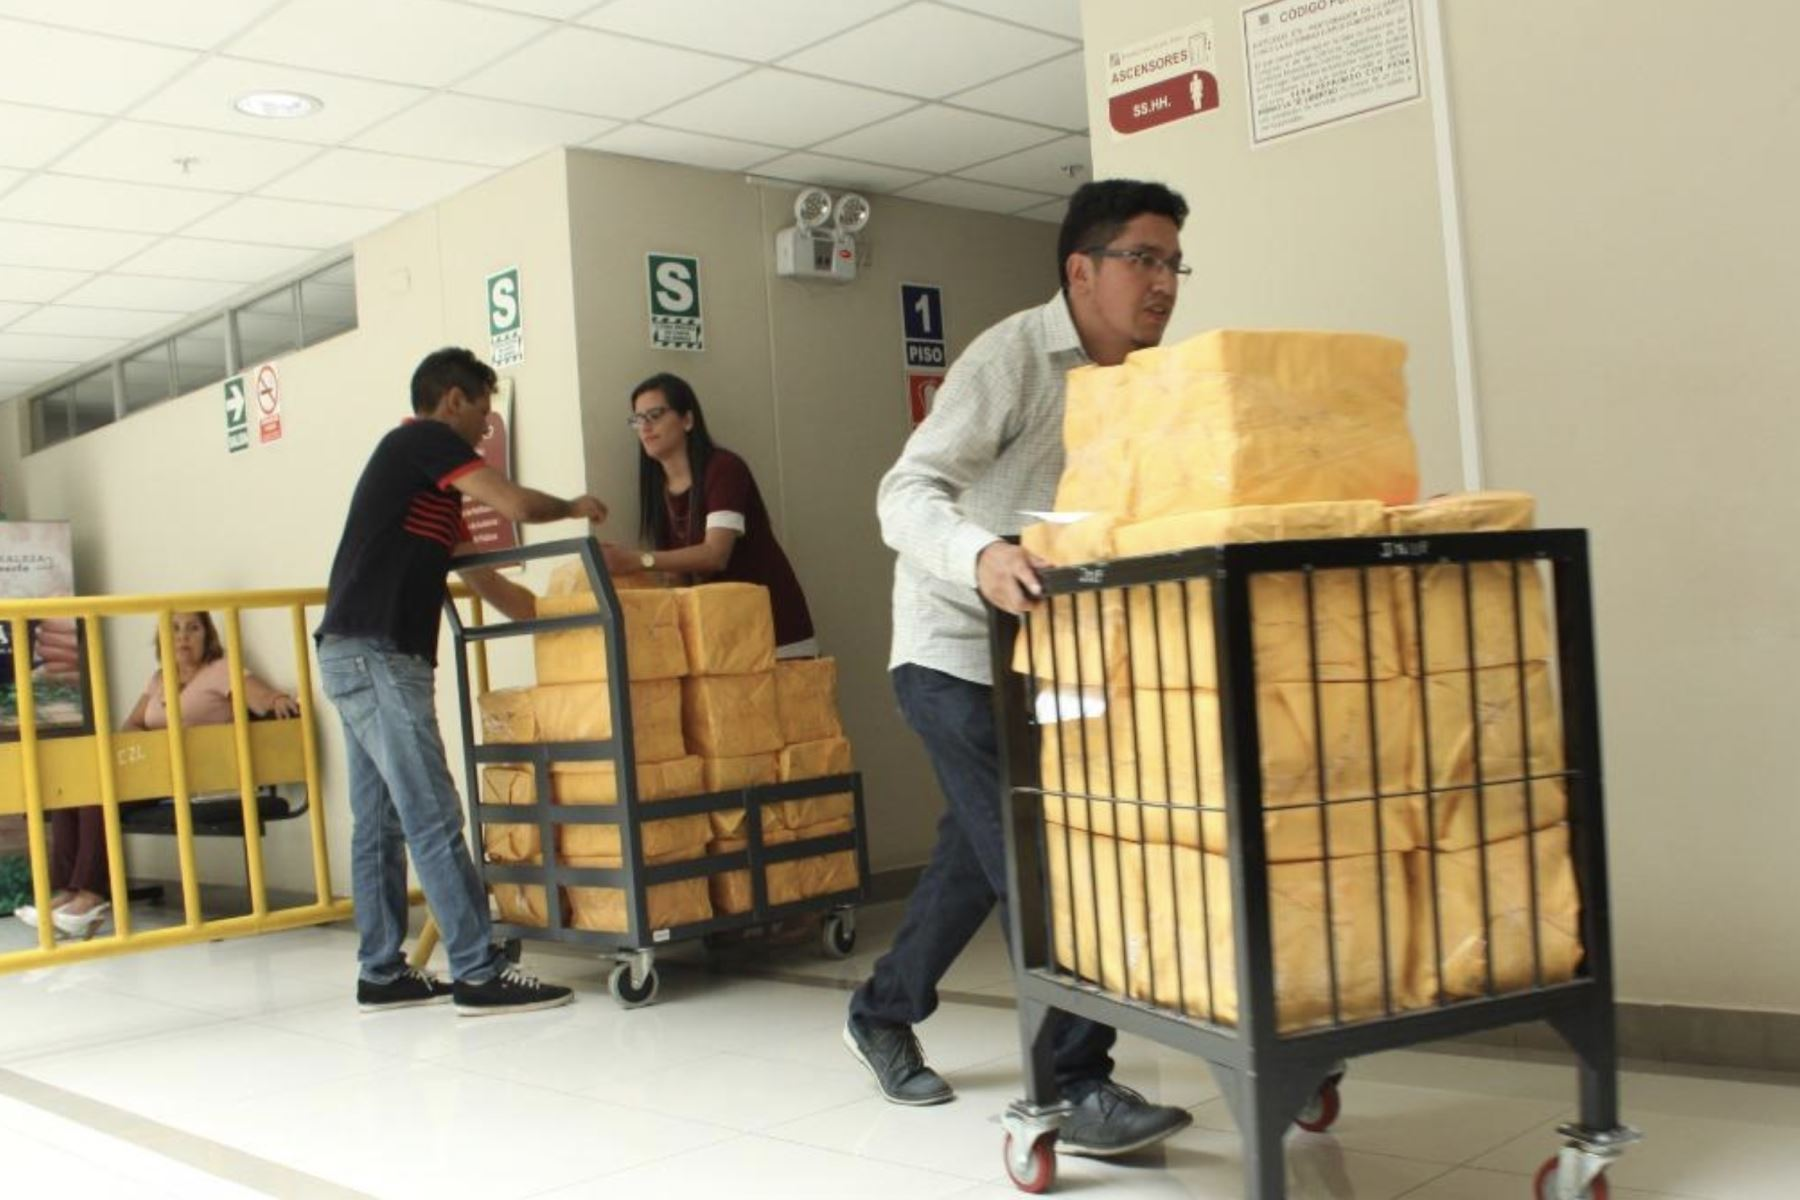 Equipo Lava Jato entregó acuerdo de colaboración eficaz con Odebrecht. Foto: ANDINA/Difusión